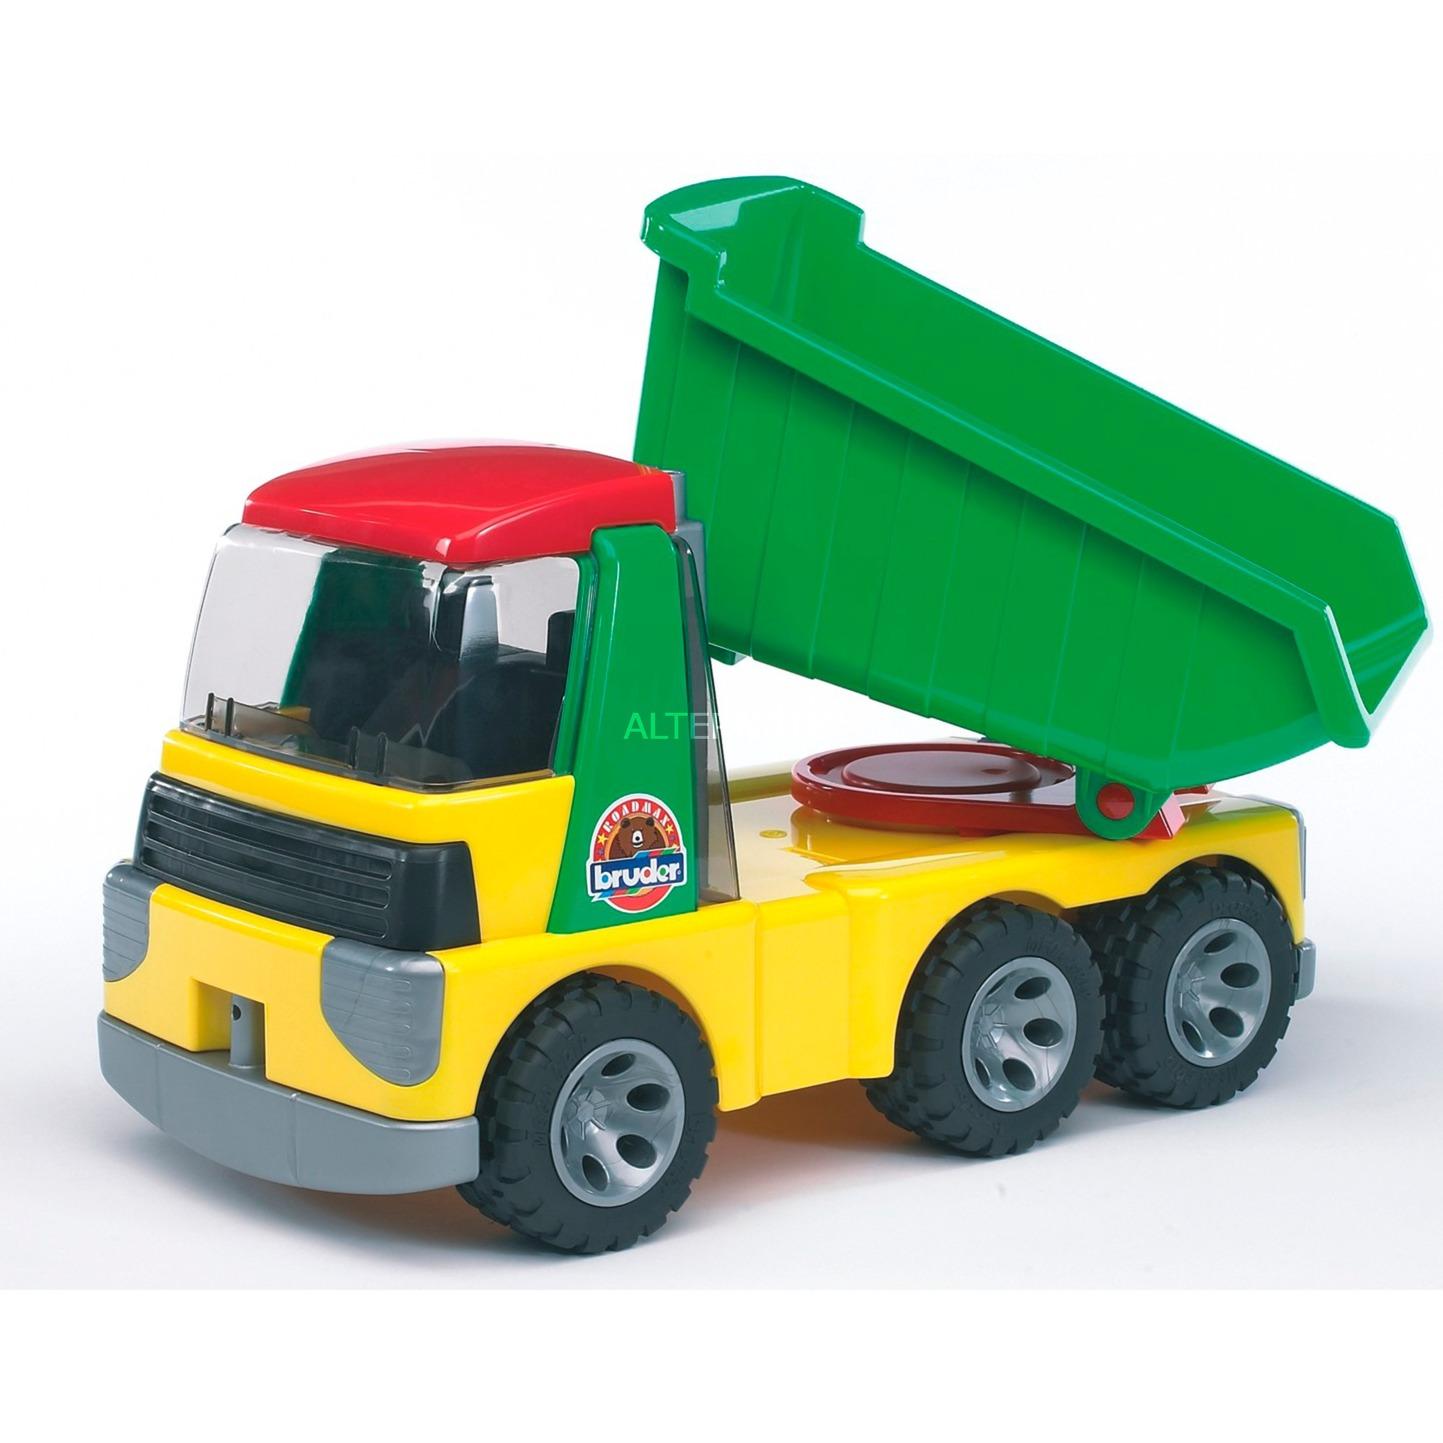 20000 modelo de juguete, Vehículo de juguete